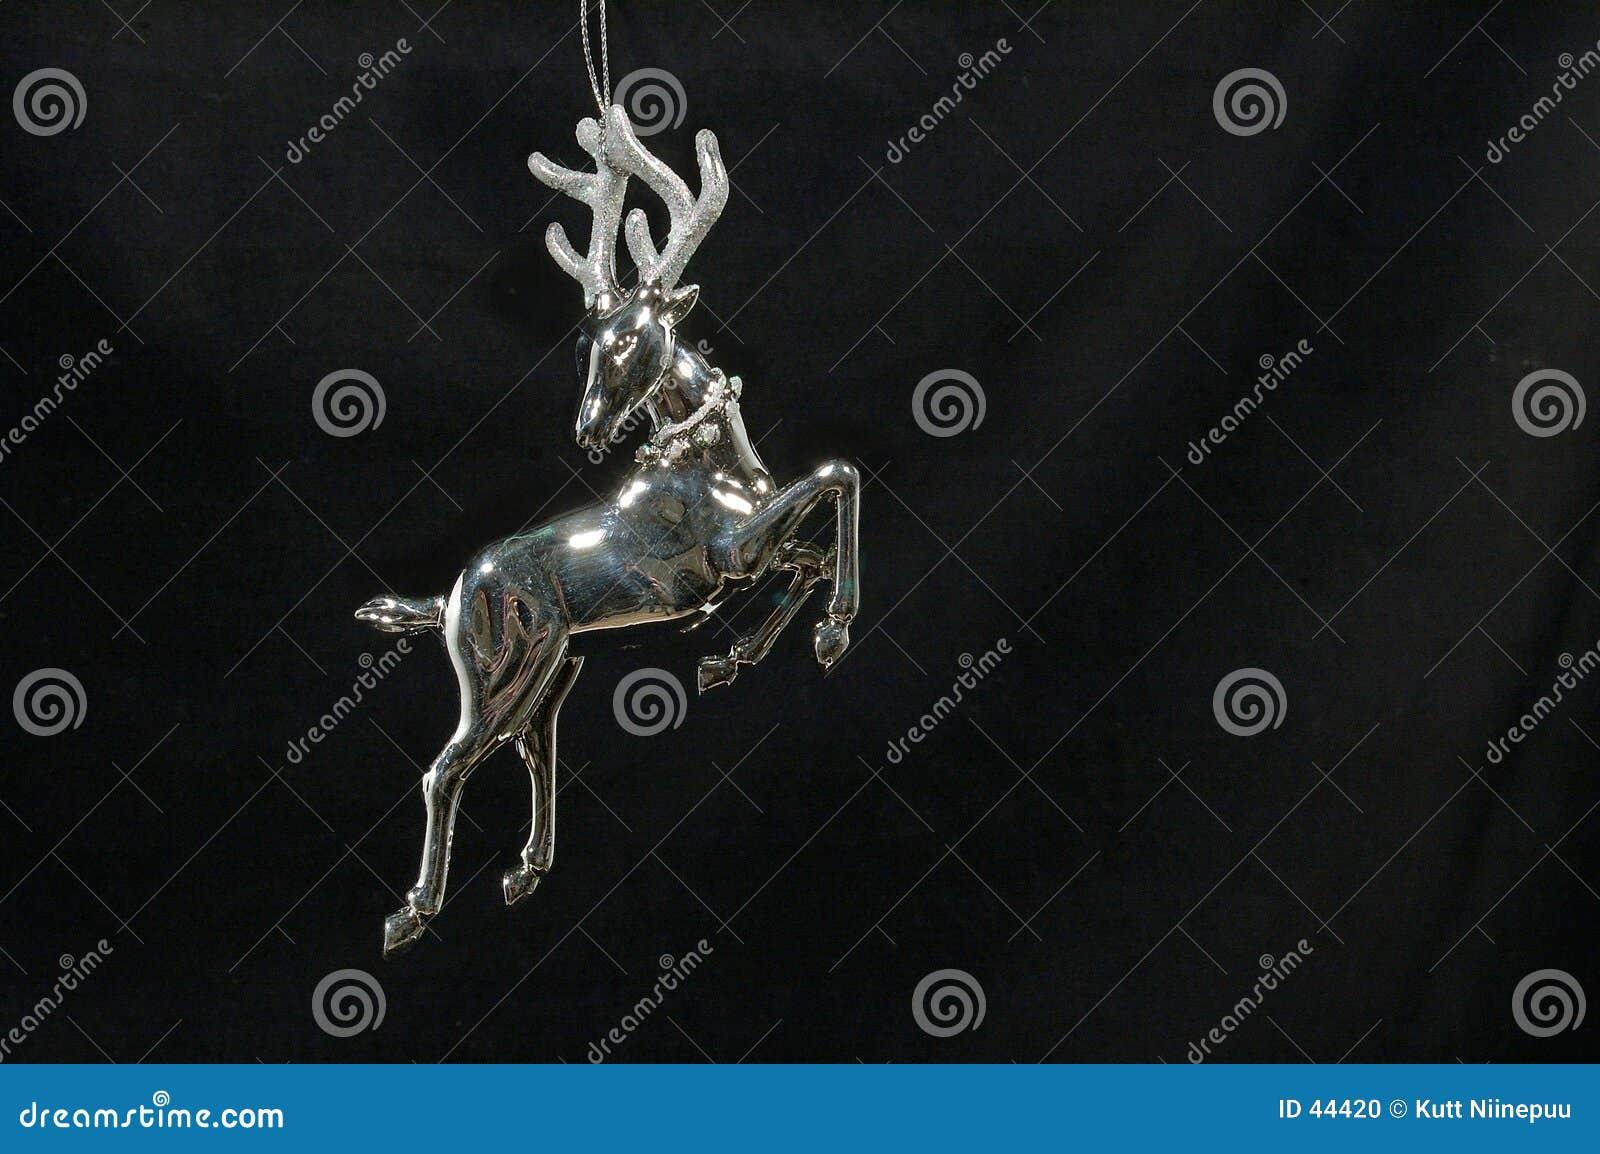 Christmas ornament - Silver Reindeer